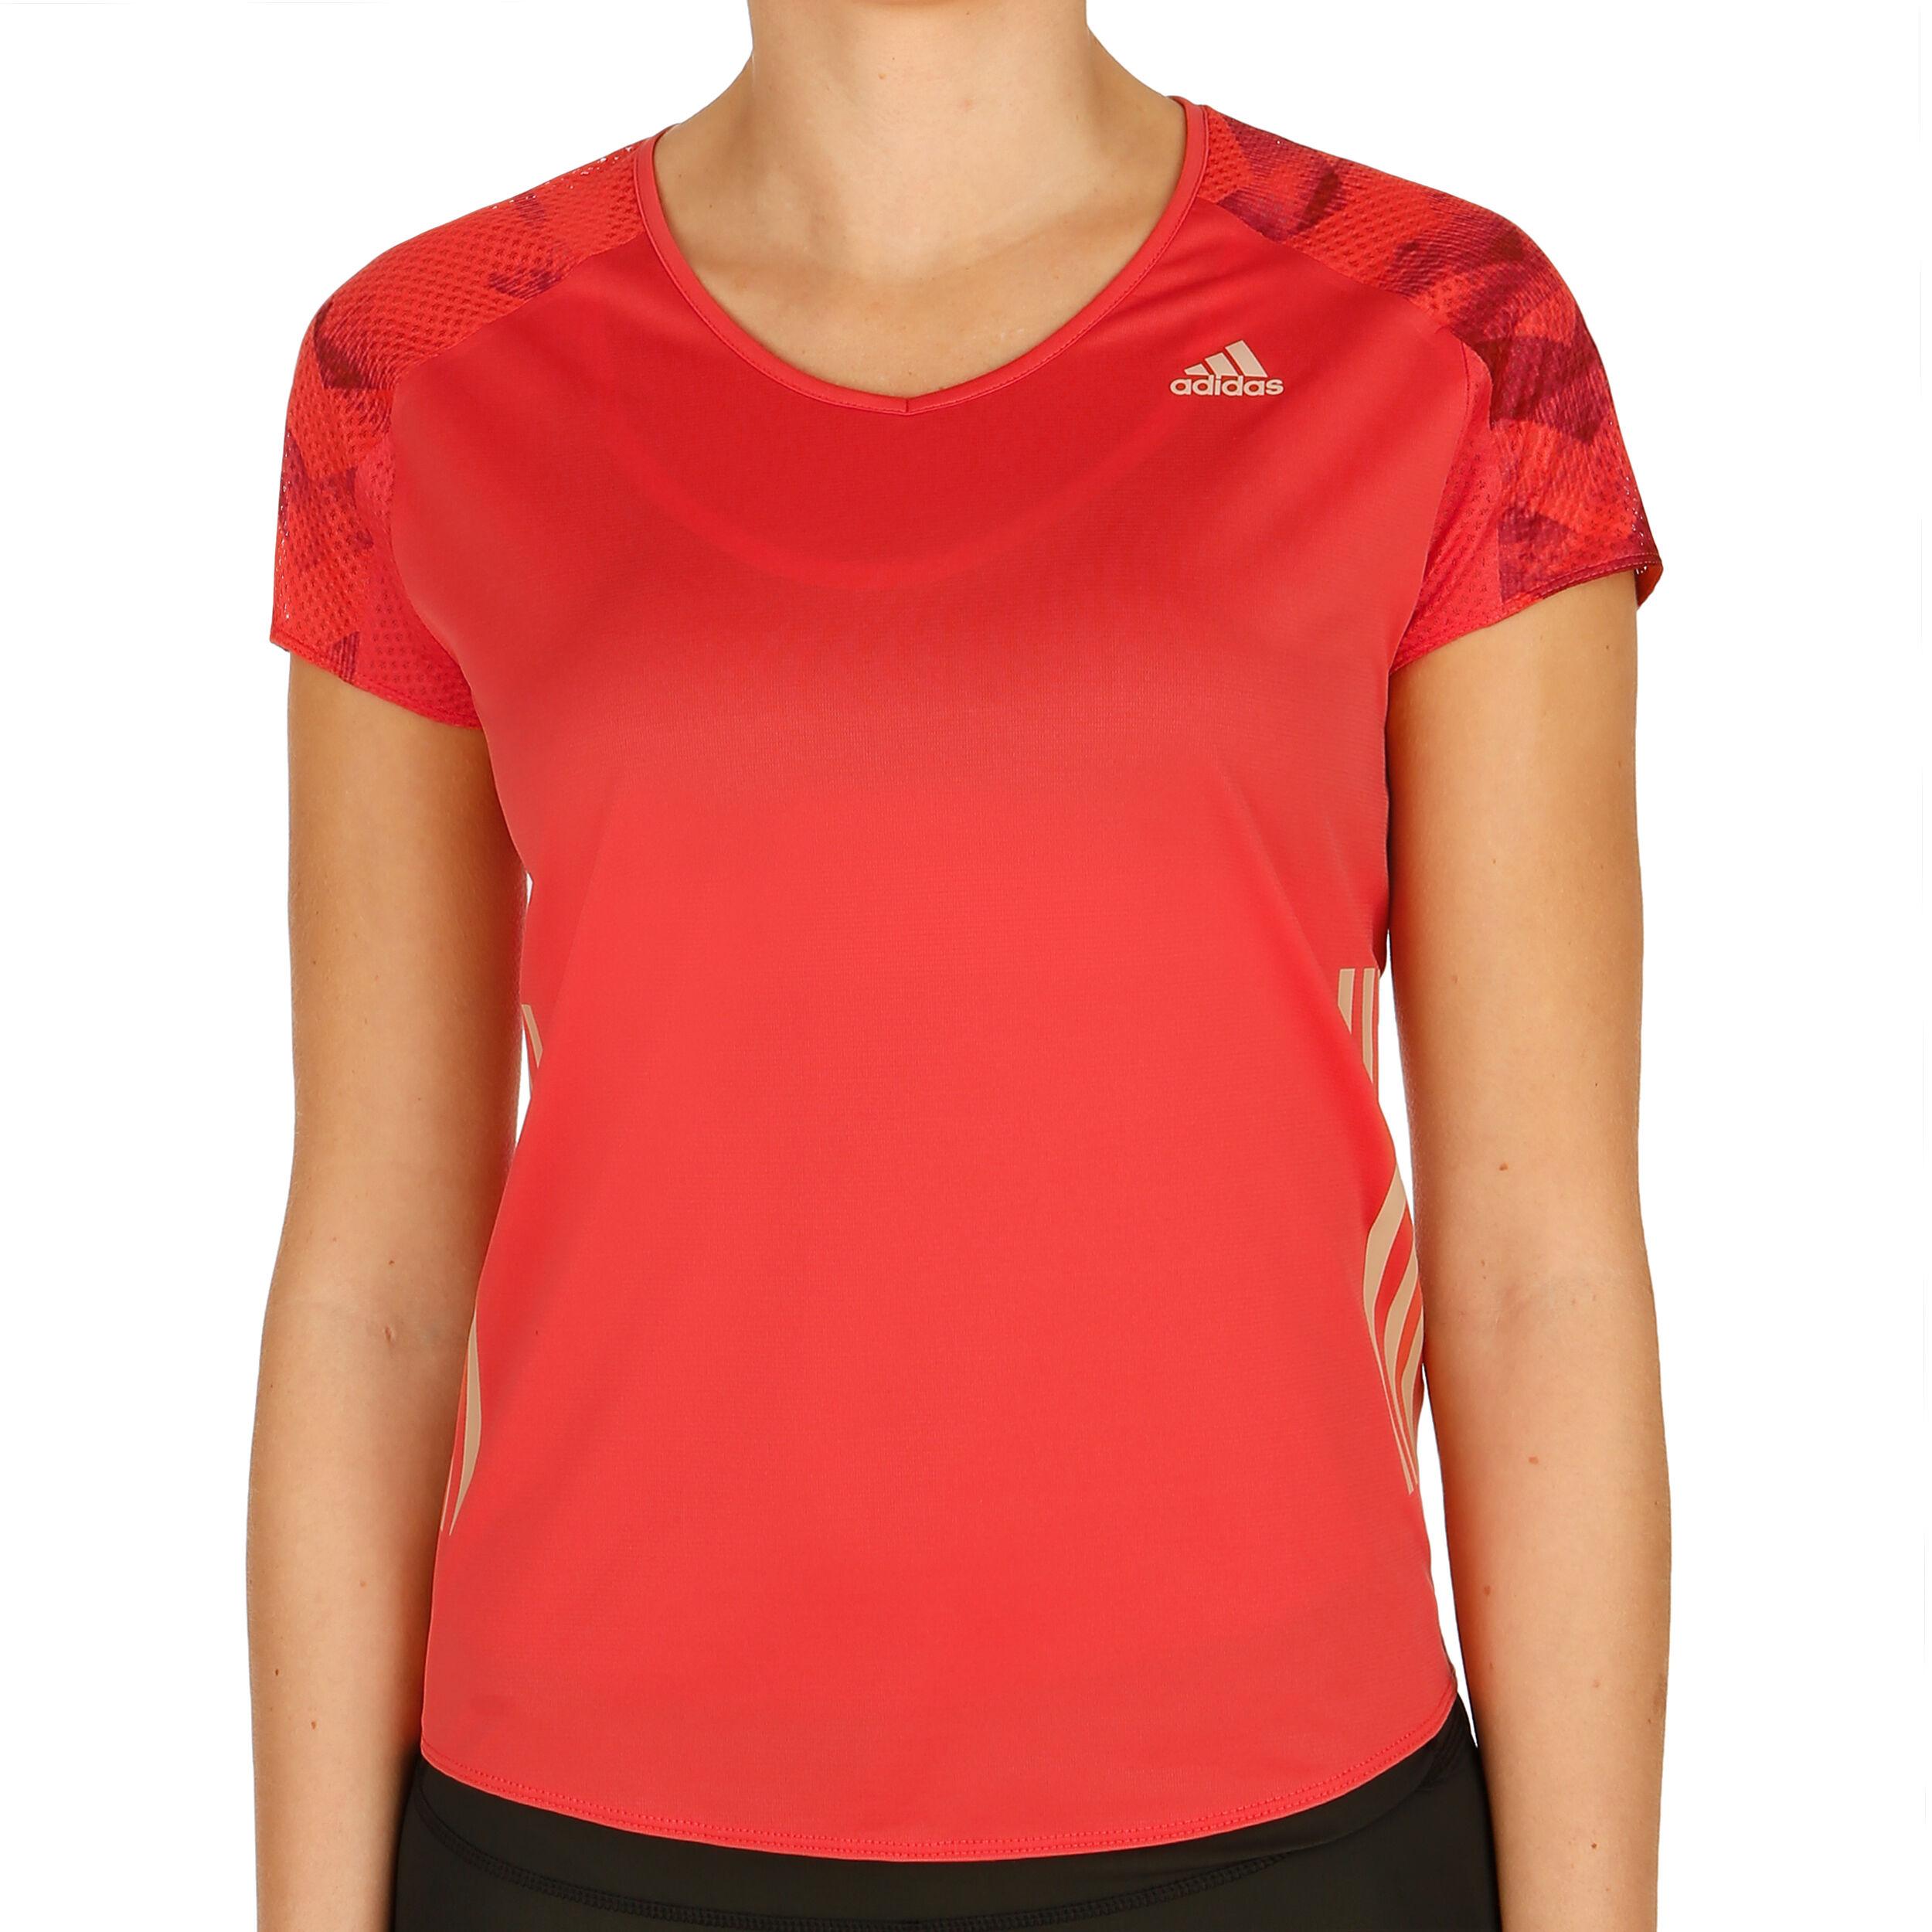 adidas Adizero T Shirt Damen Orange, Dunkelrot online